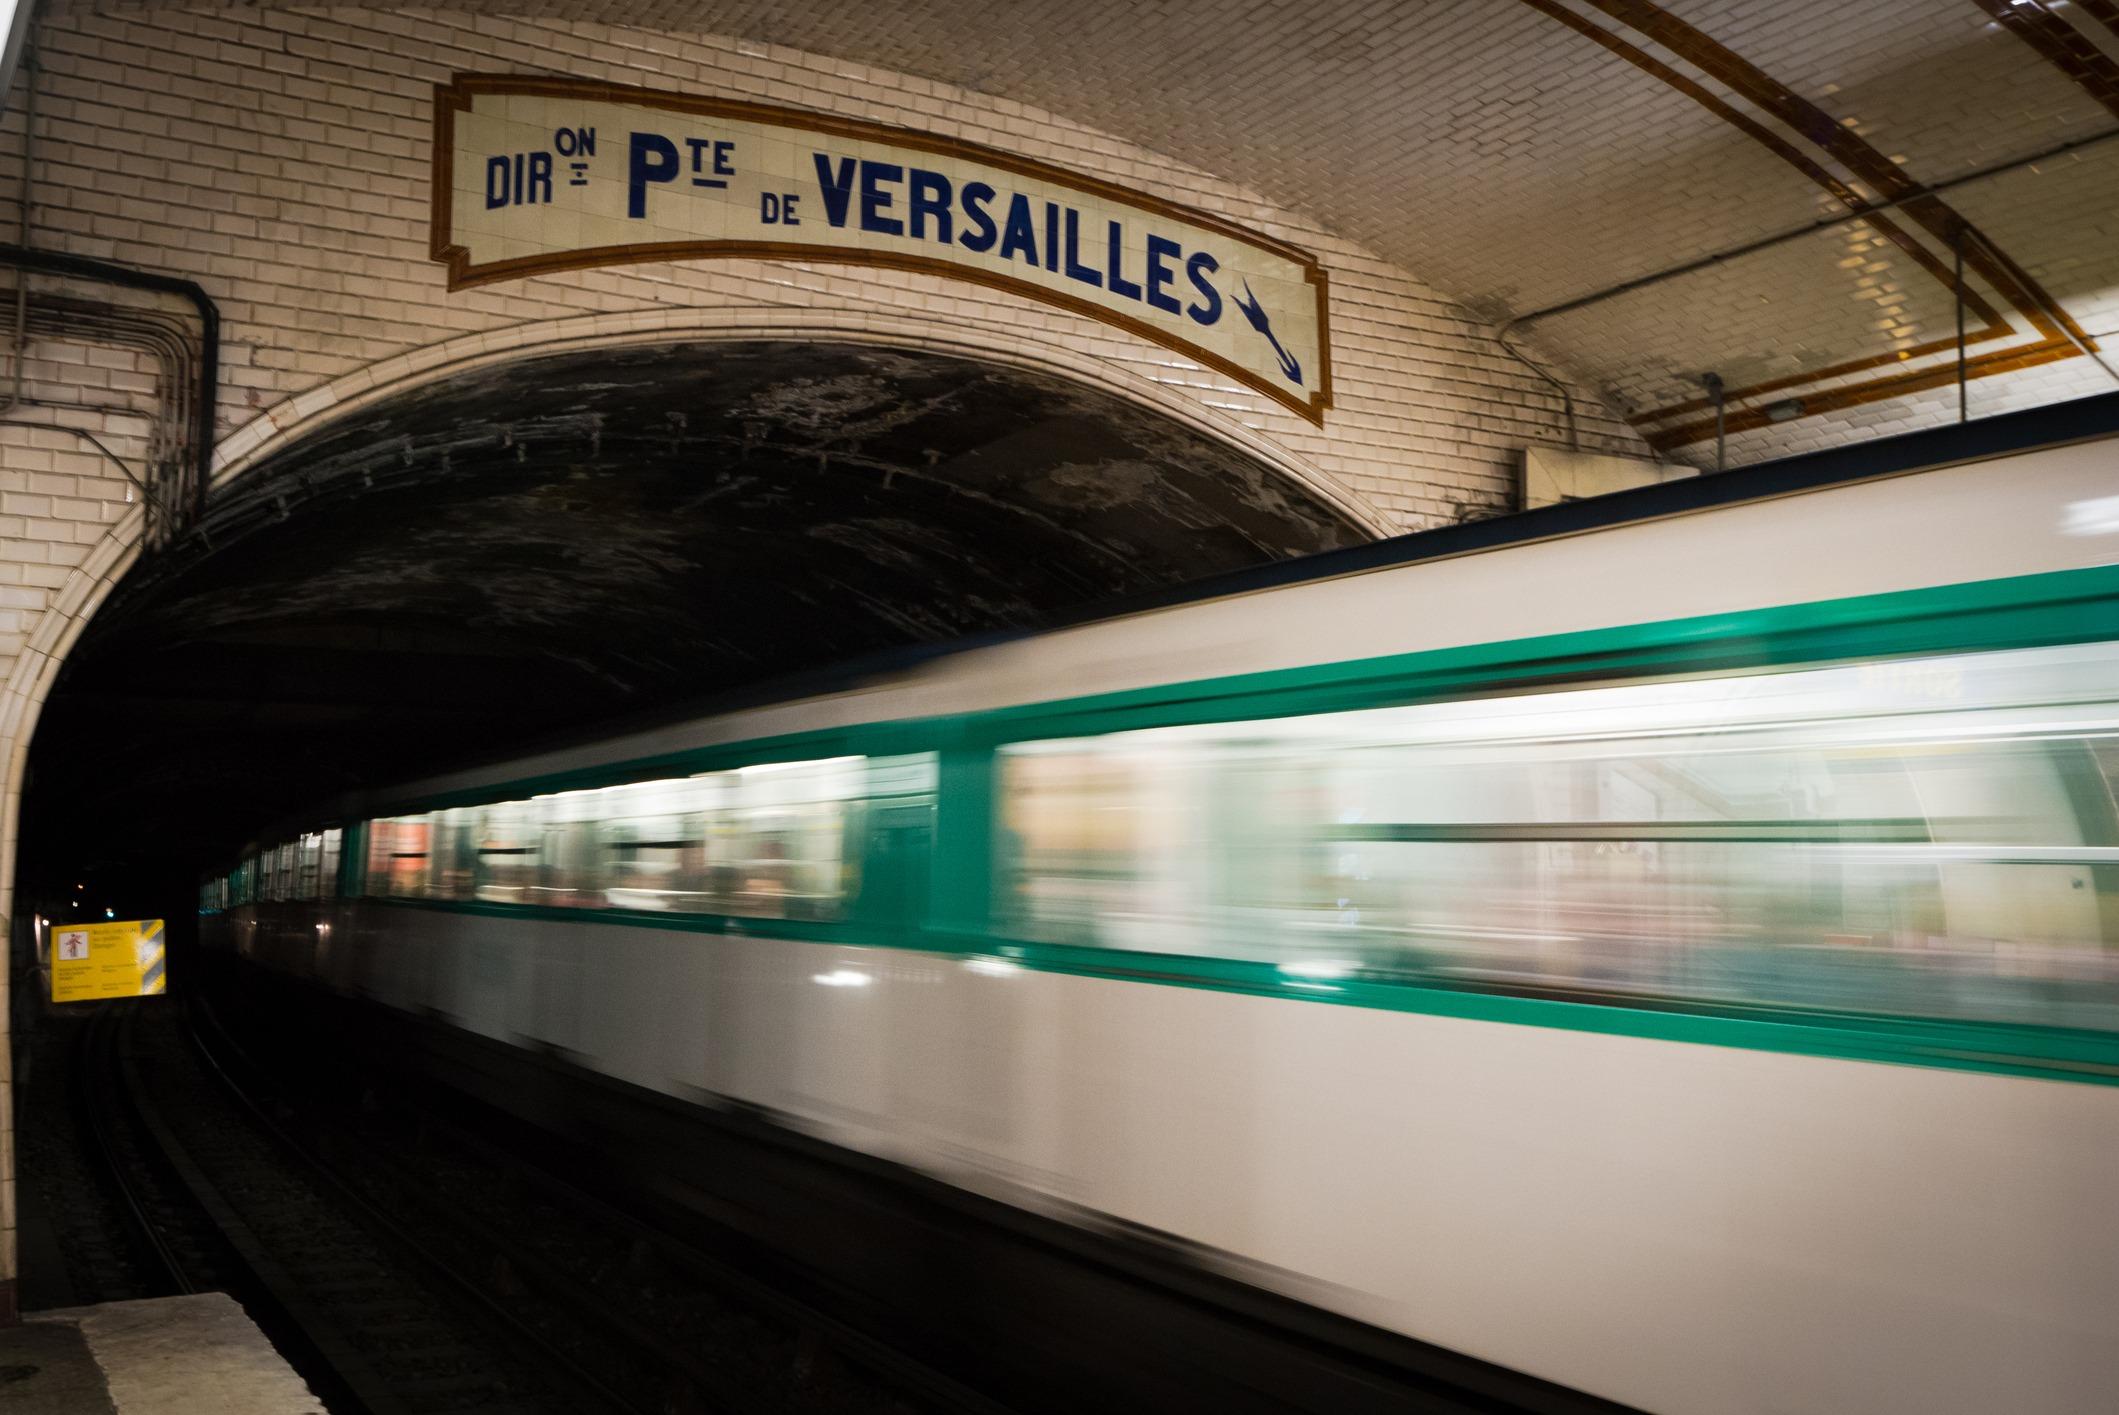 Parisian metro train headed towards Porte de Versailles